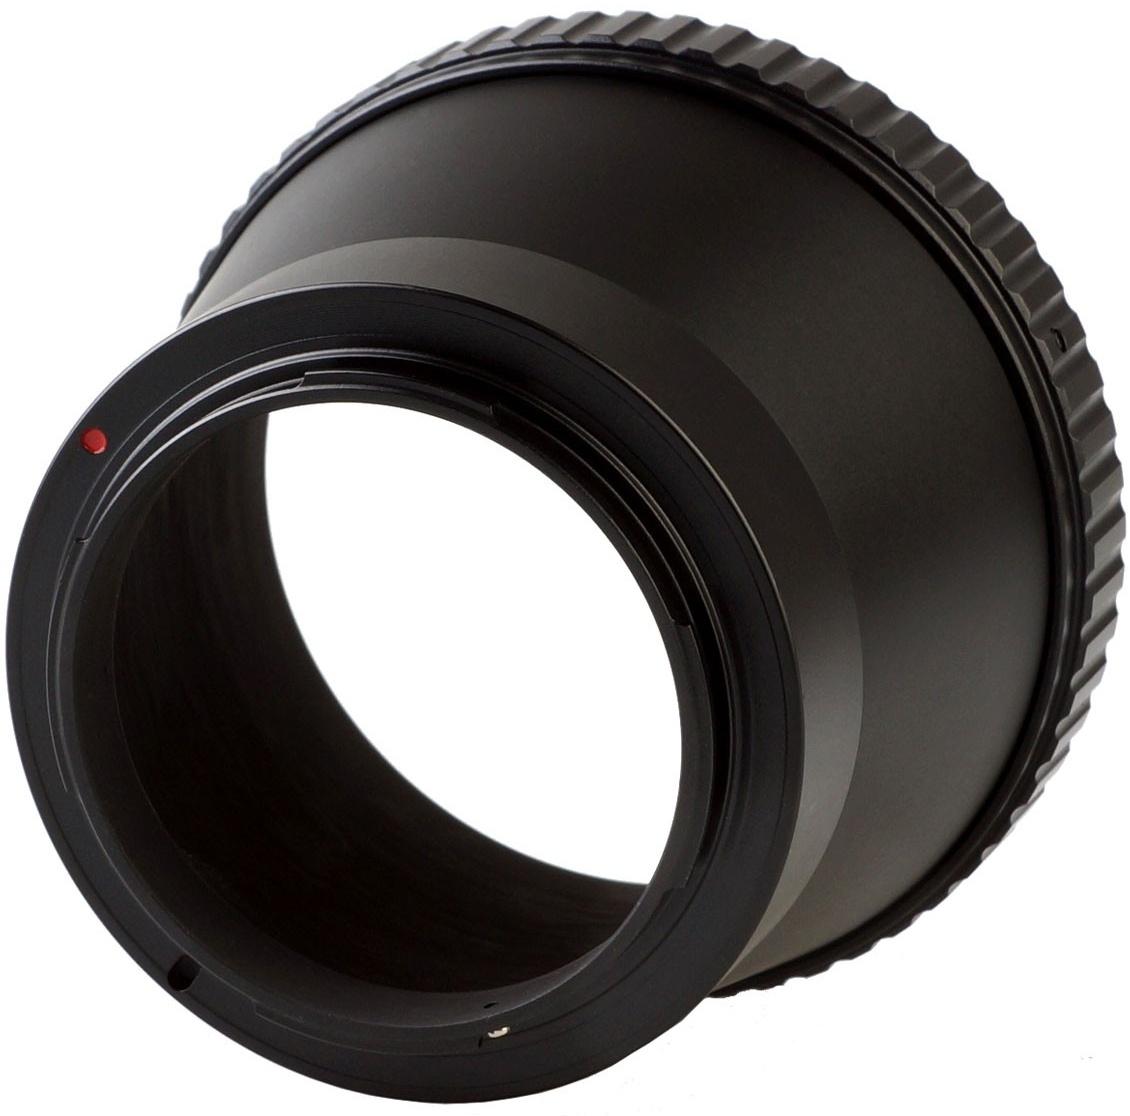 B.I.G. adaptér objektivu Hasselblad V na tělo Nikon Z